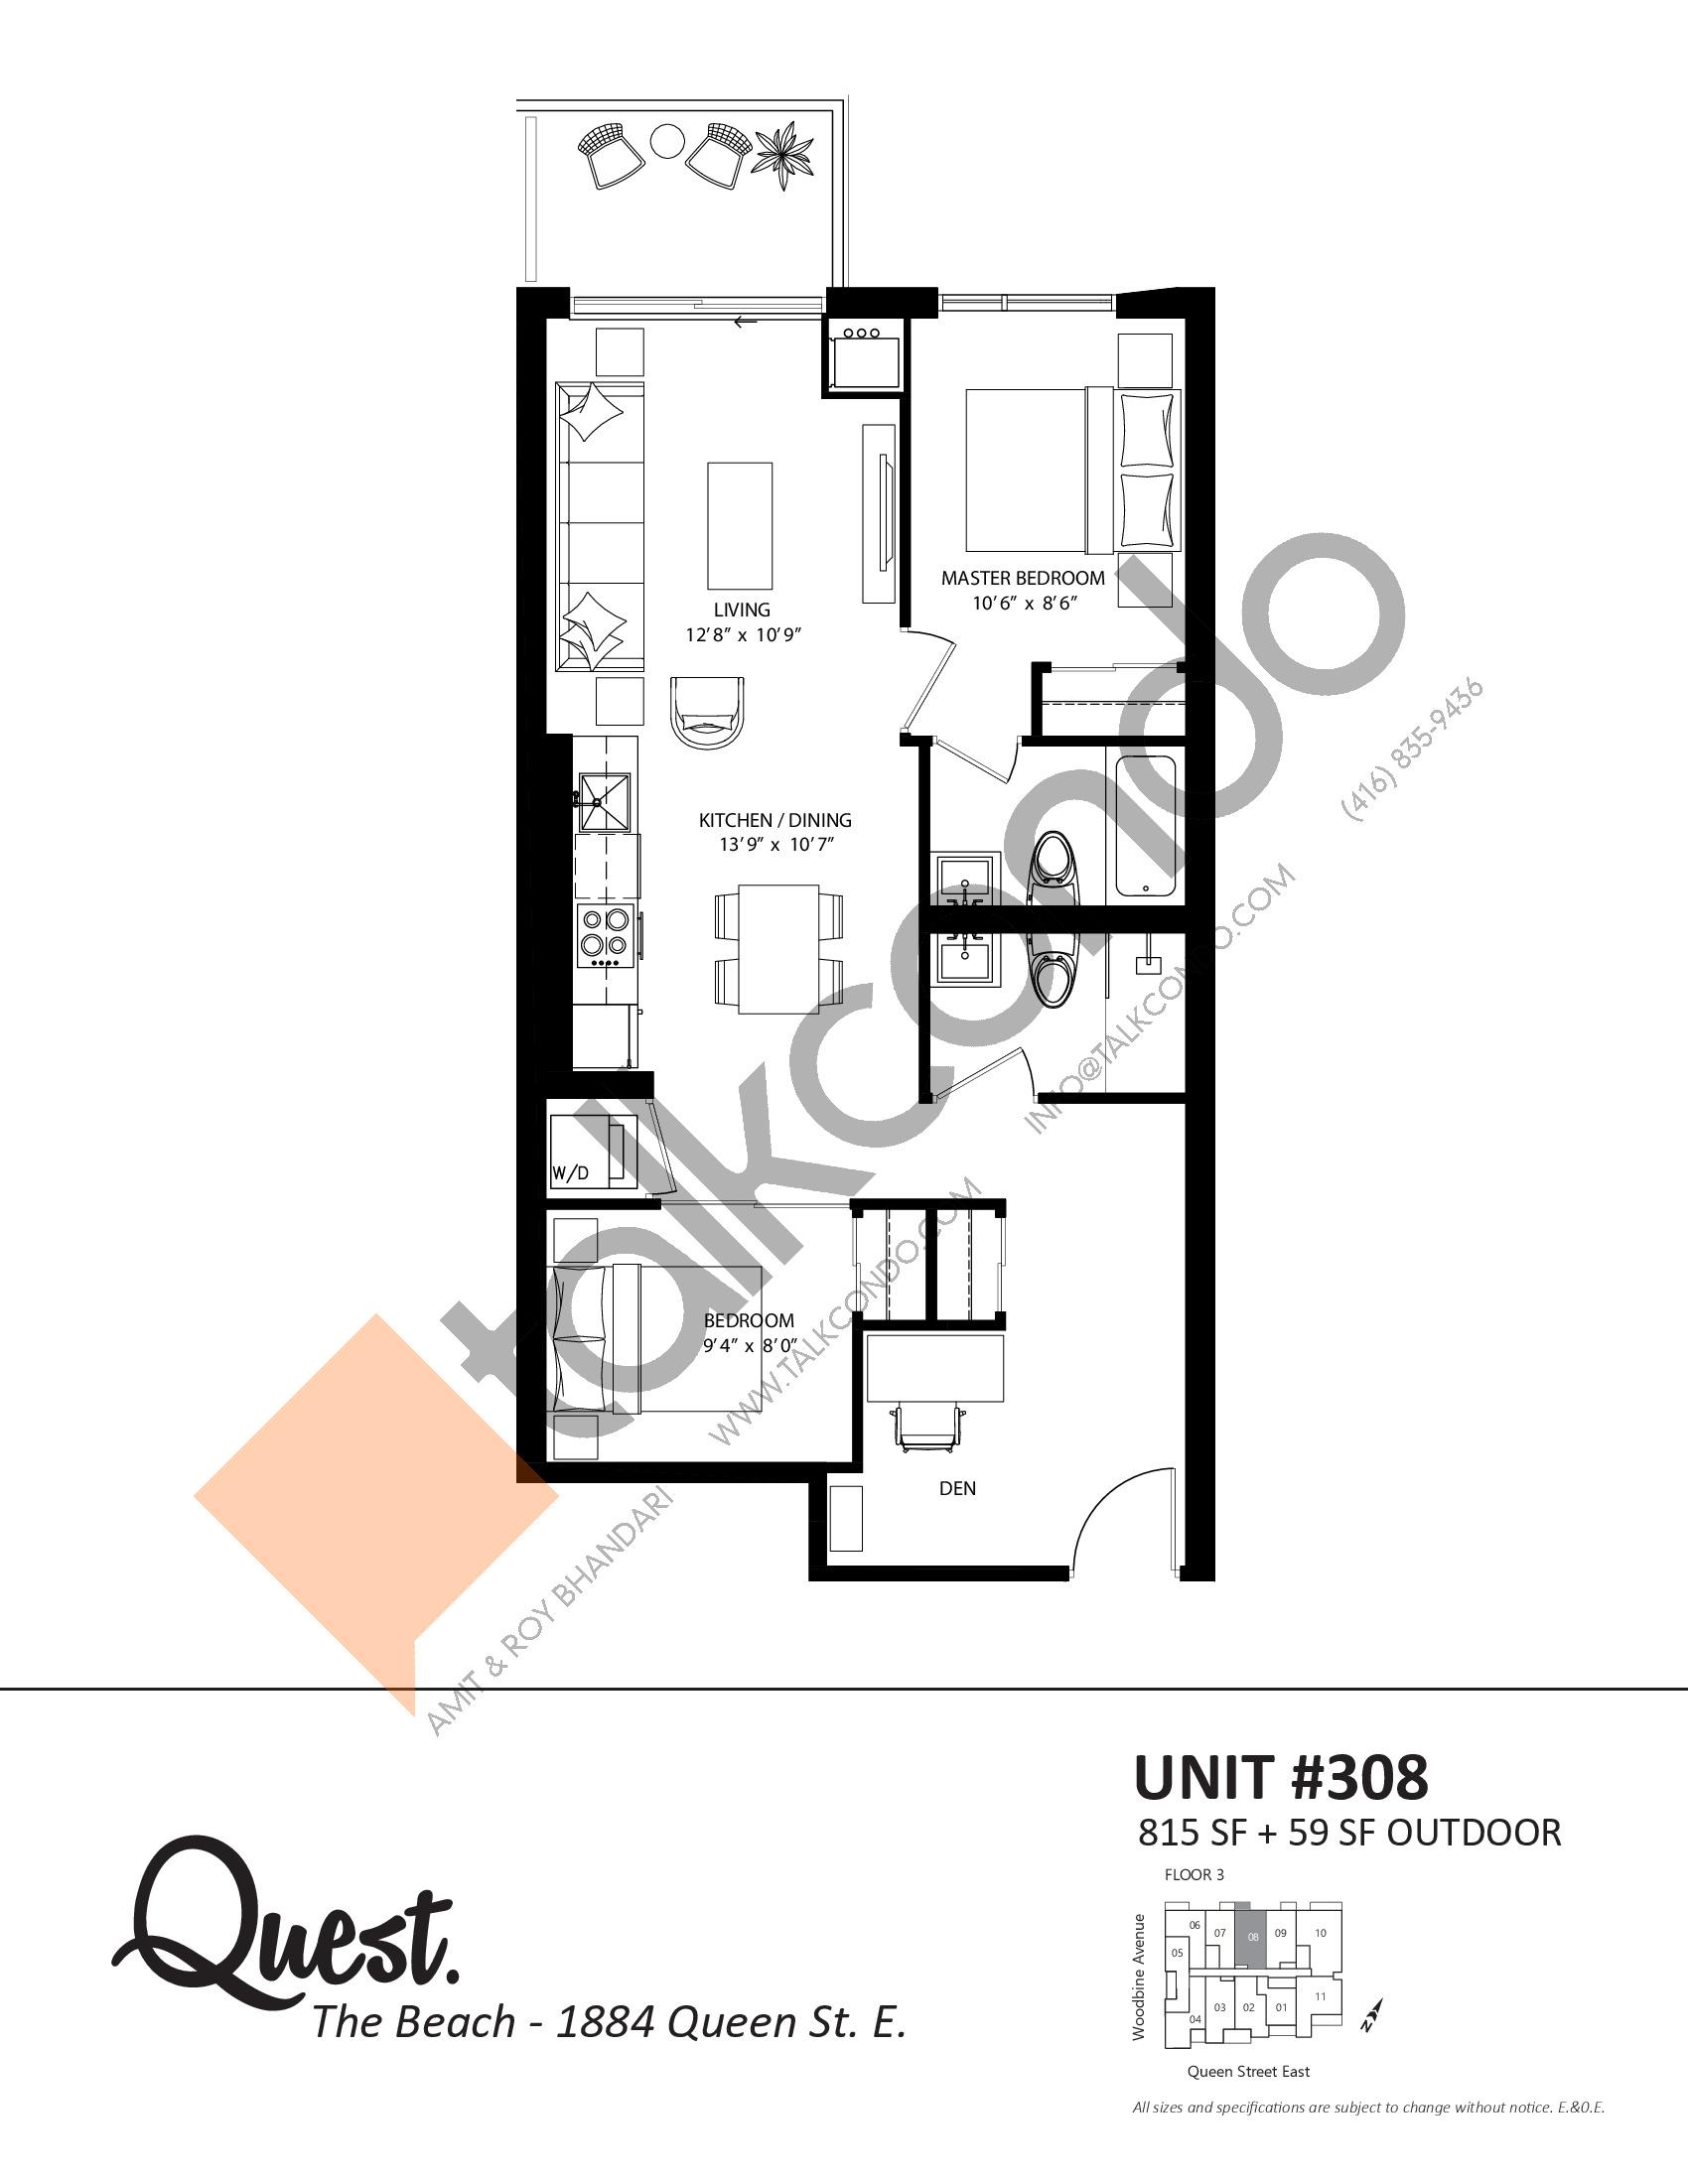 Unit 308 Floor Plan at Heartwood the Beach Condos - 815 sq.ft